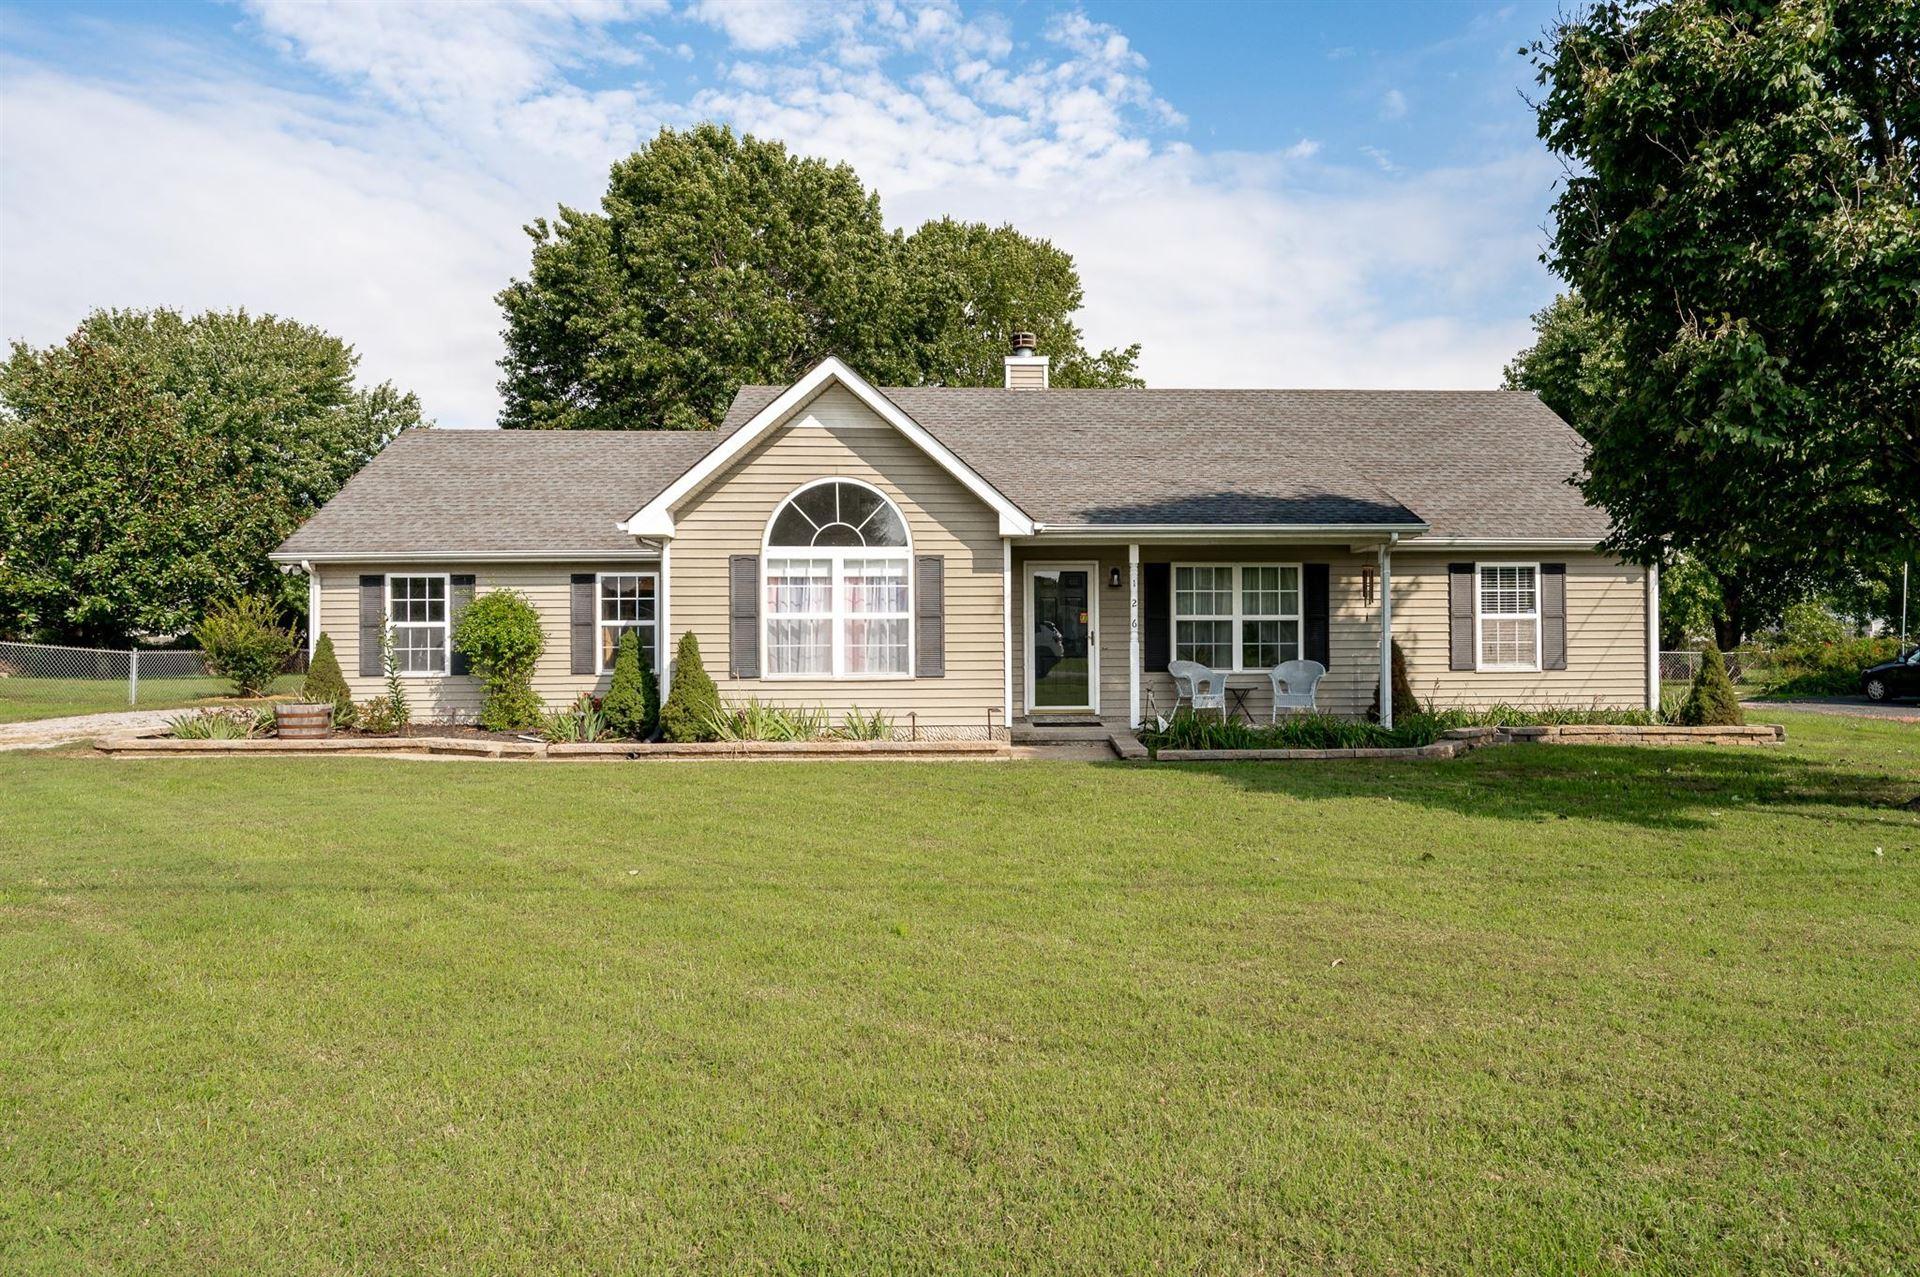 Photo of 126 Ziffell Dr, Murfreesboro, TN 37128 (MLS # 2300260)